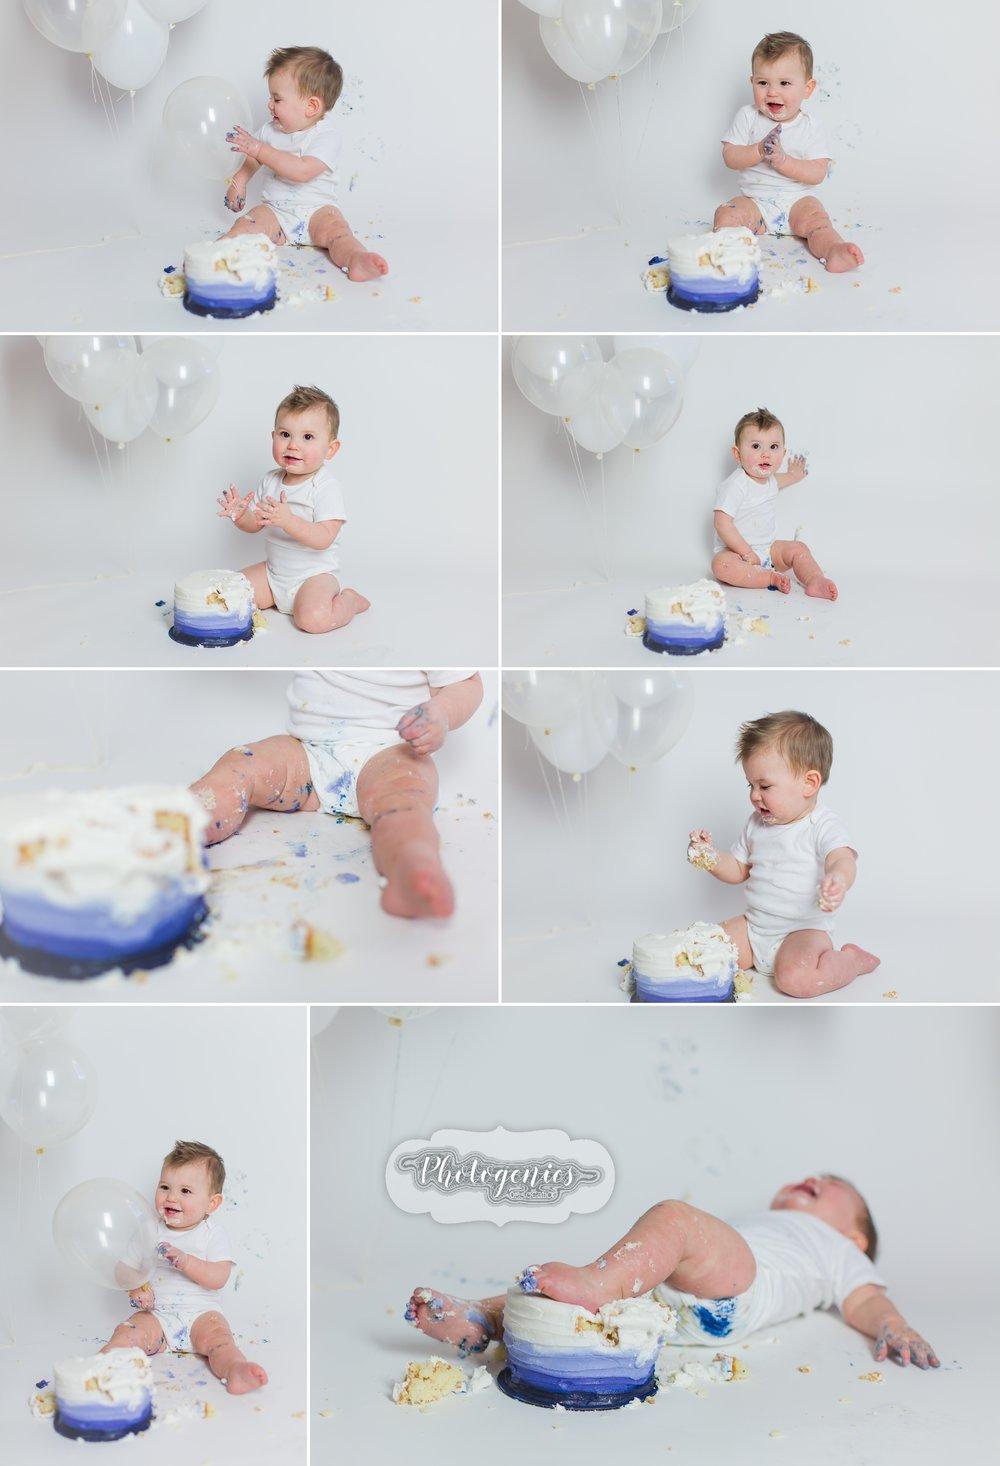 boy_cake_smash_simple_blue_white_balloons_ideas_decor_photography_timeless.jpg